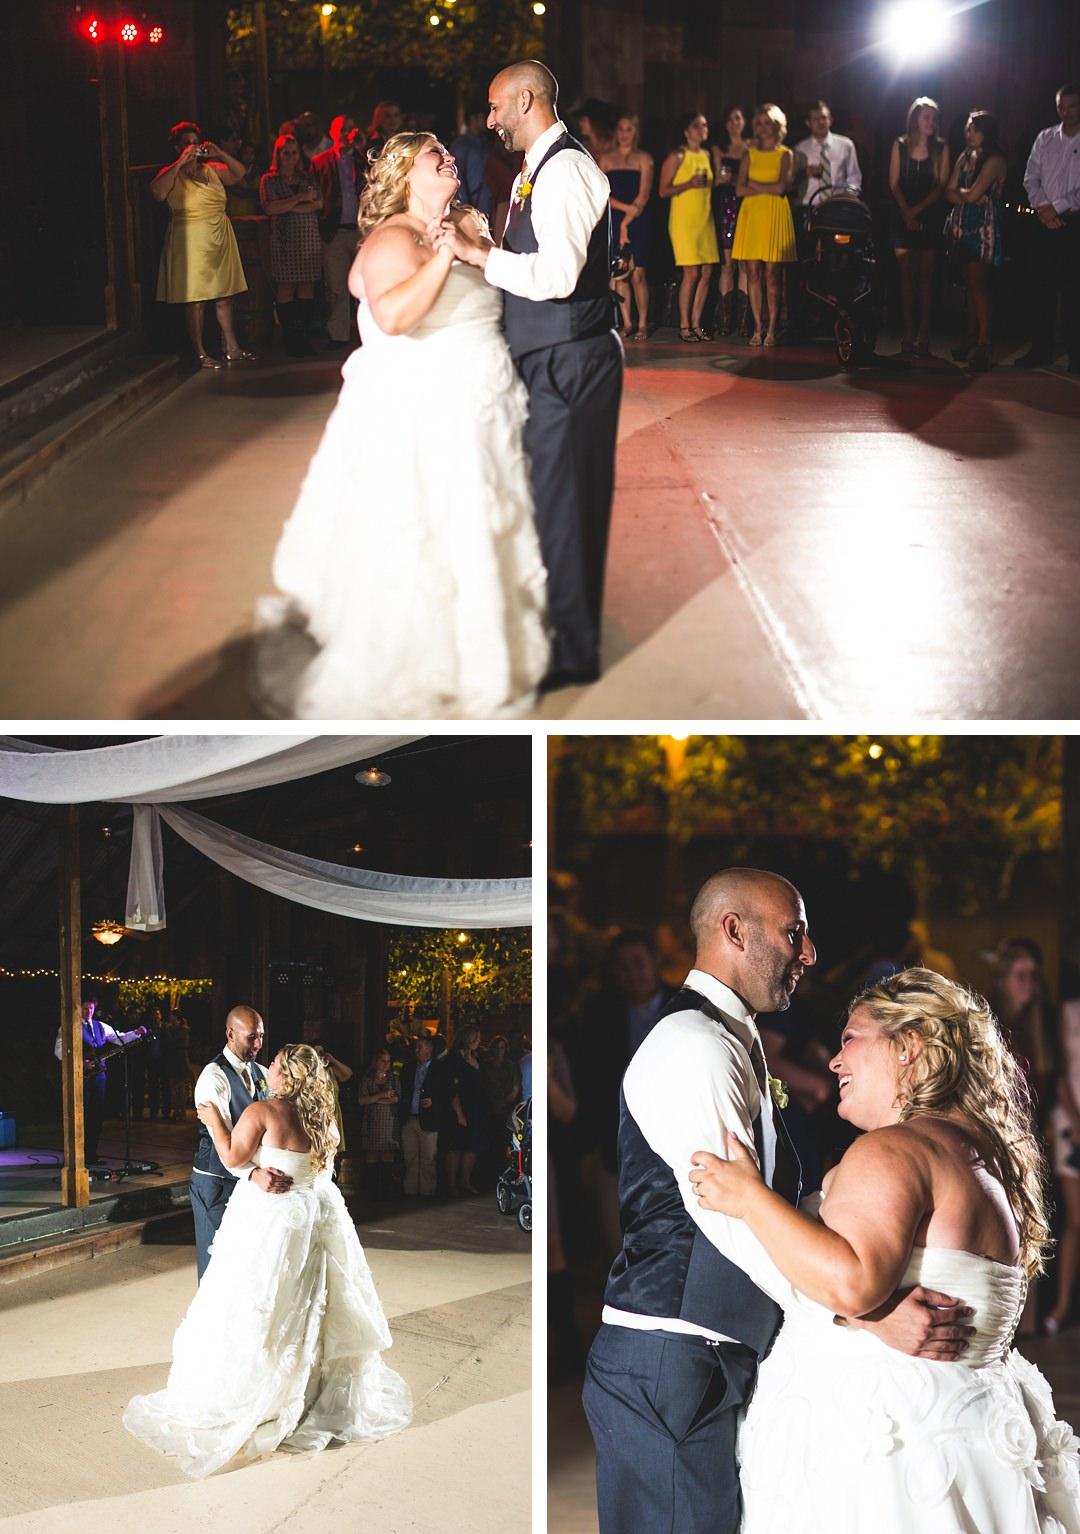 Scott english photo arizona wedding photographer_0066.jpg